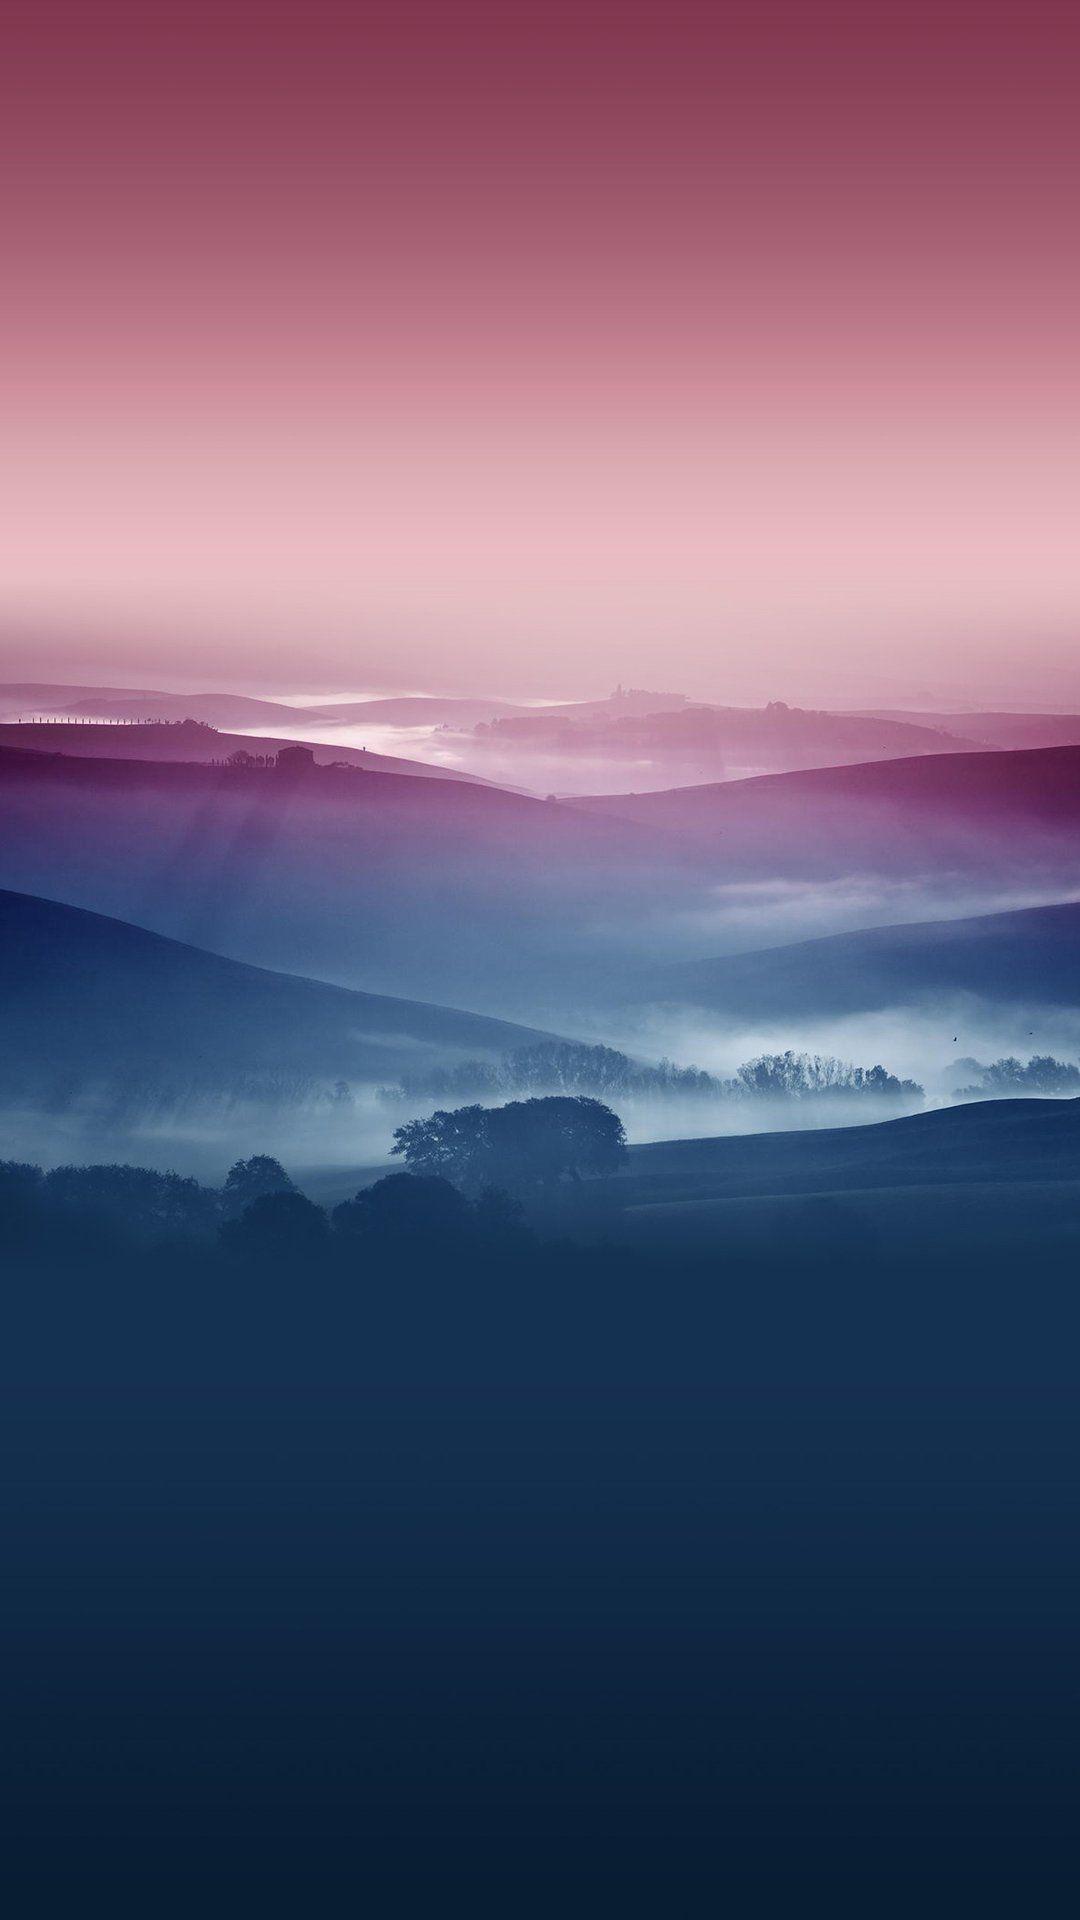 Beautiful Phone Wallpapers   Top Beautiful Phone Backgrounds 1080x1920